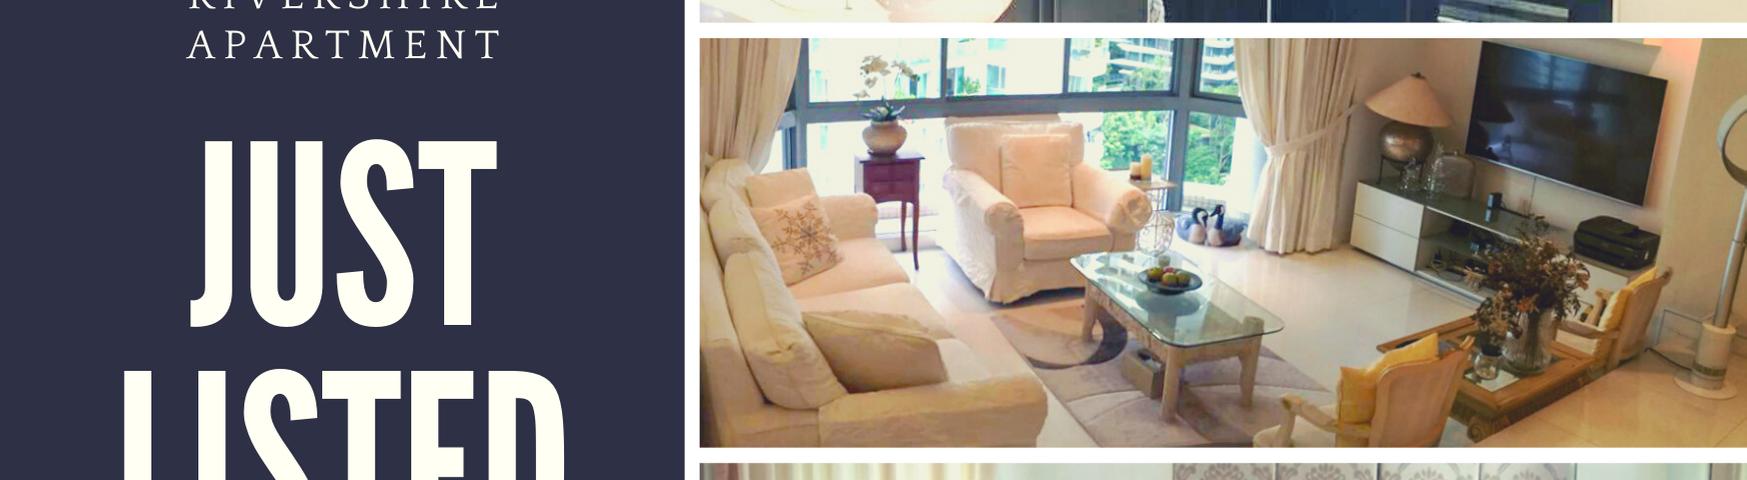 rivershire apartment rent